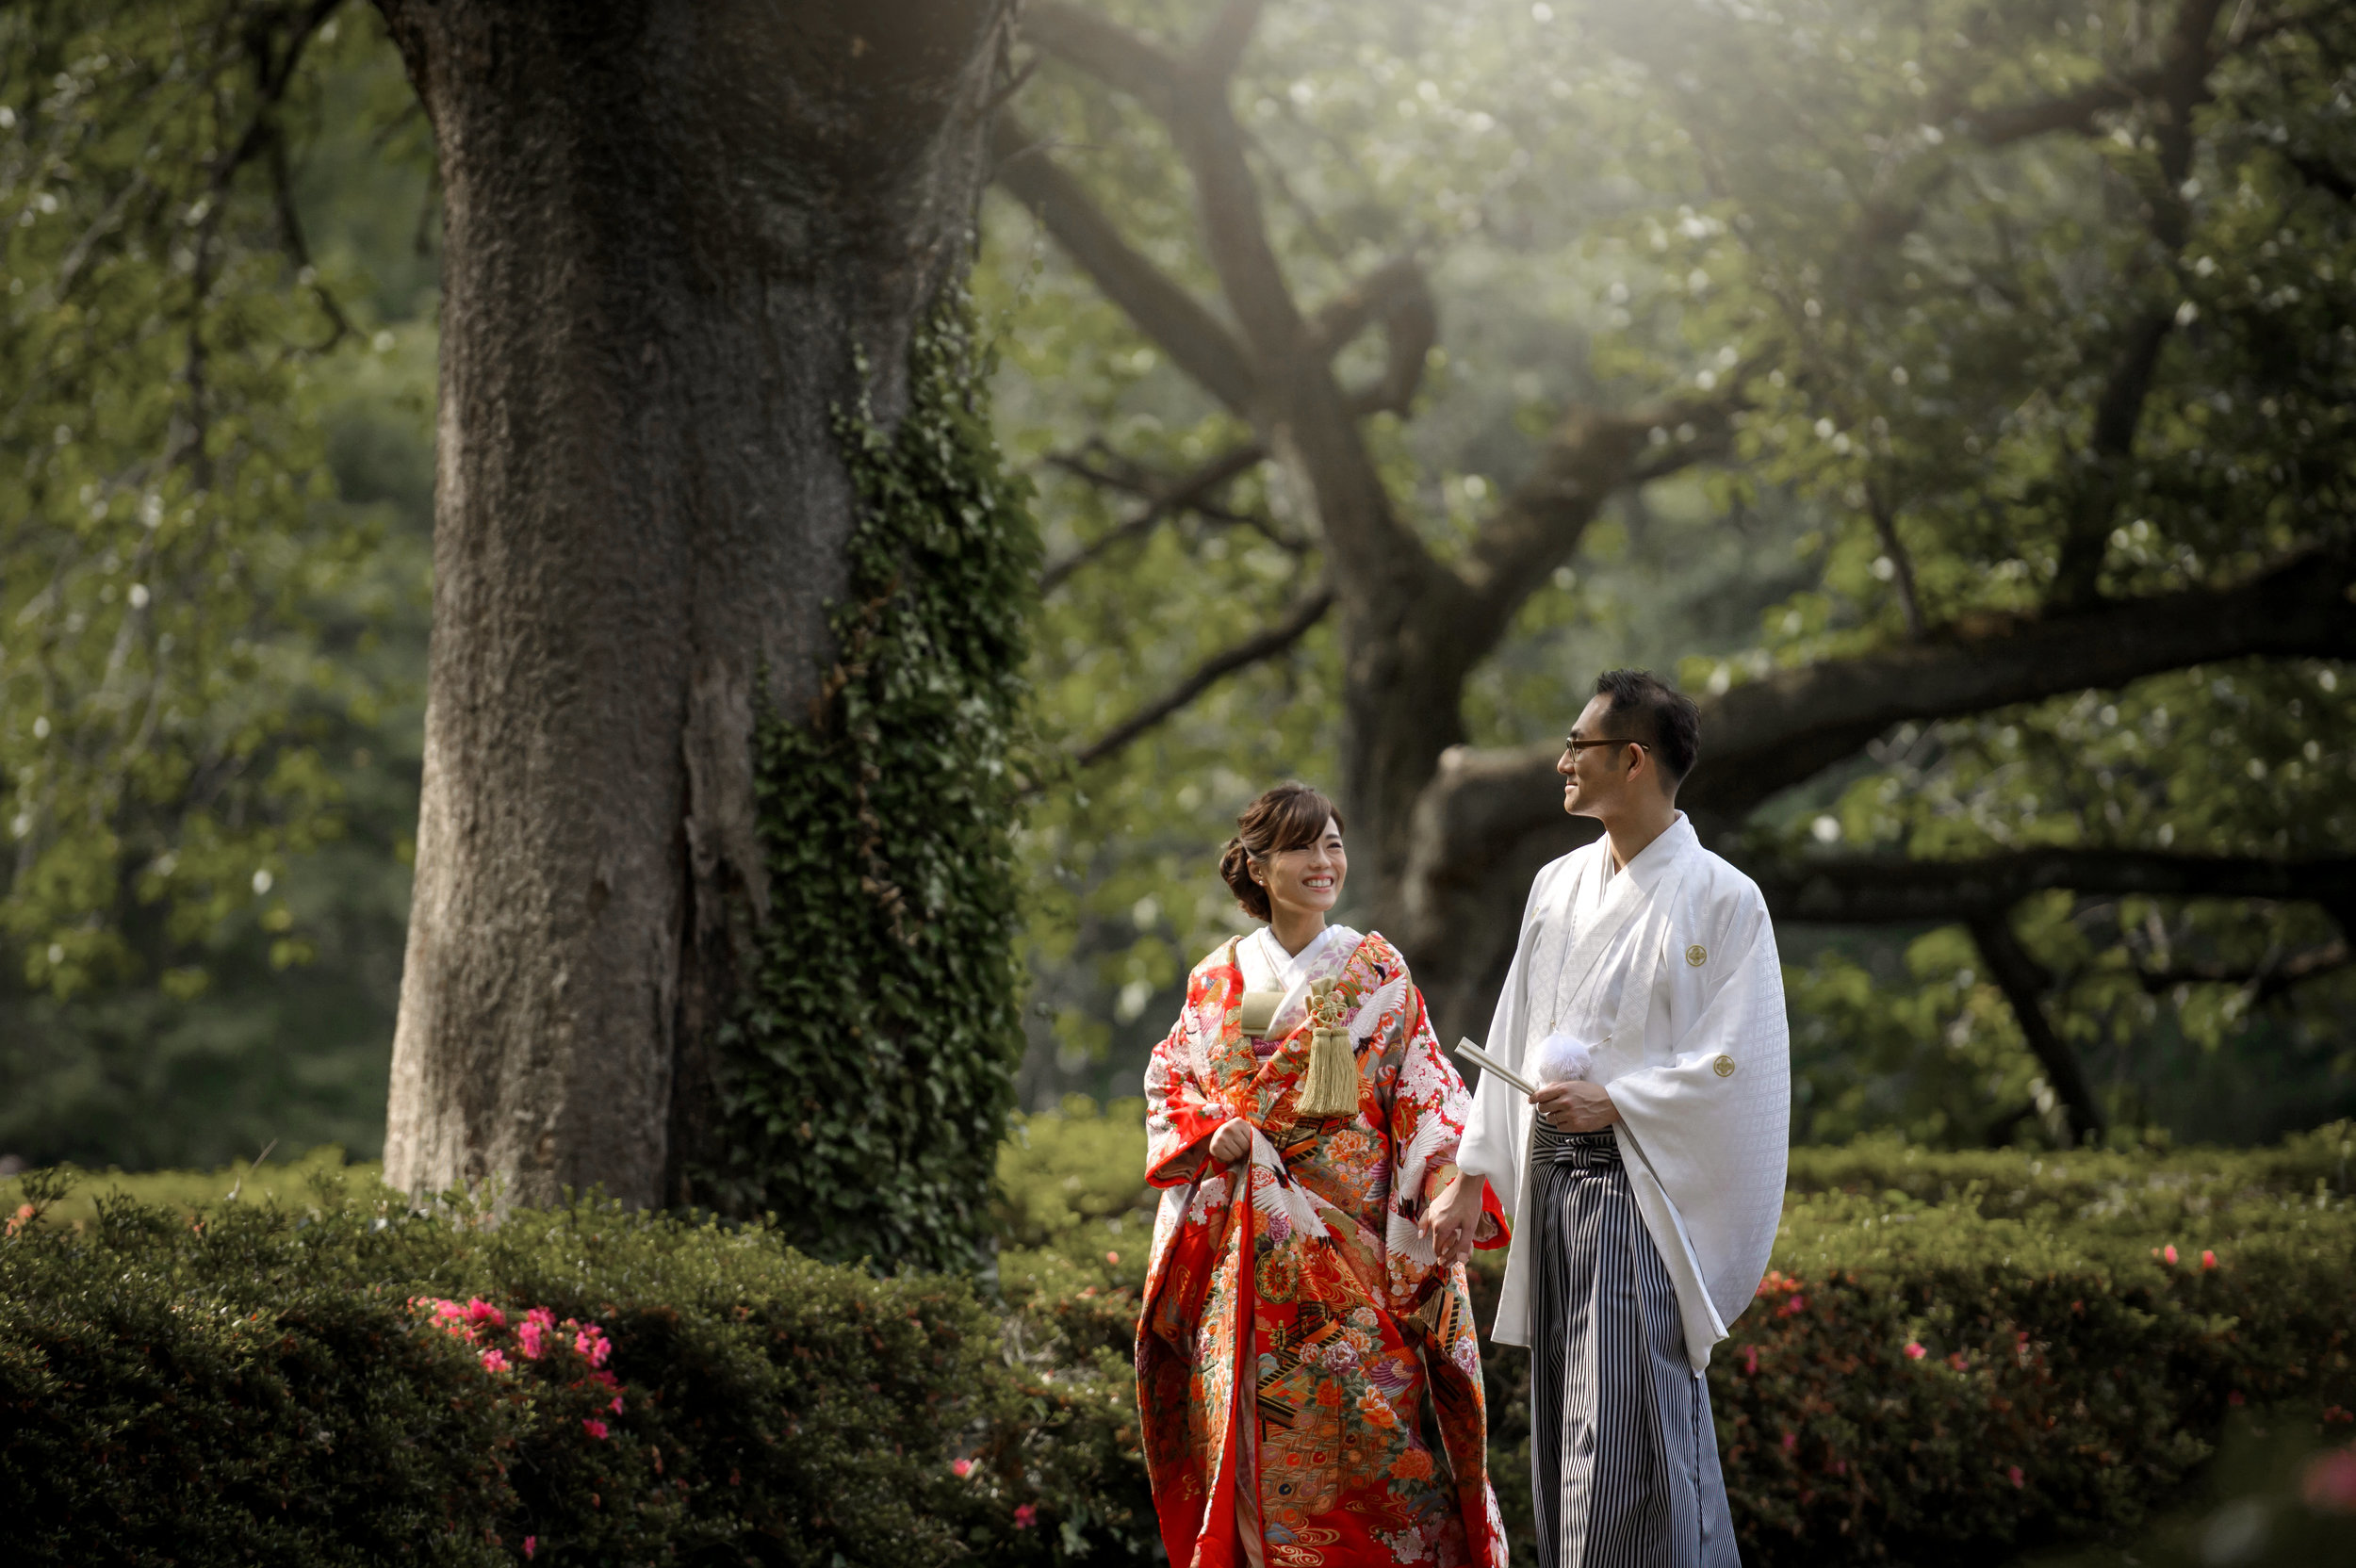 Kimono Elopement in Japan